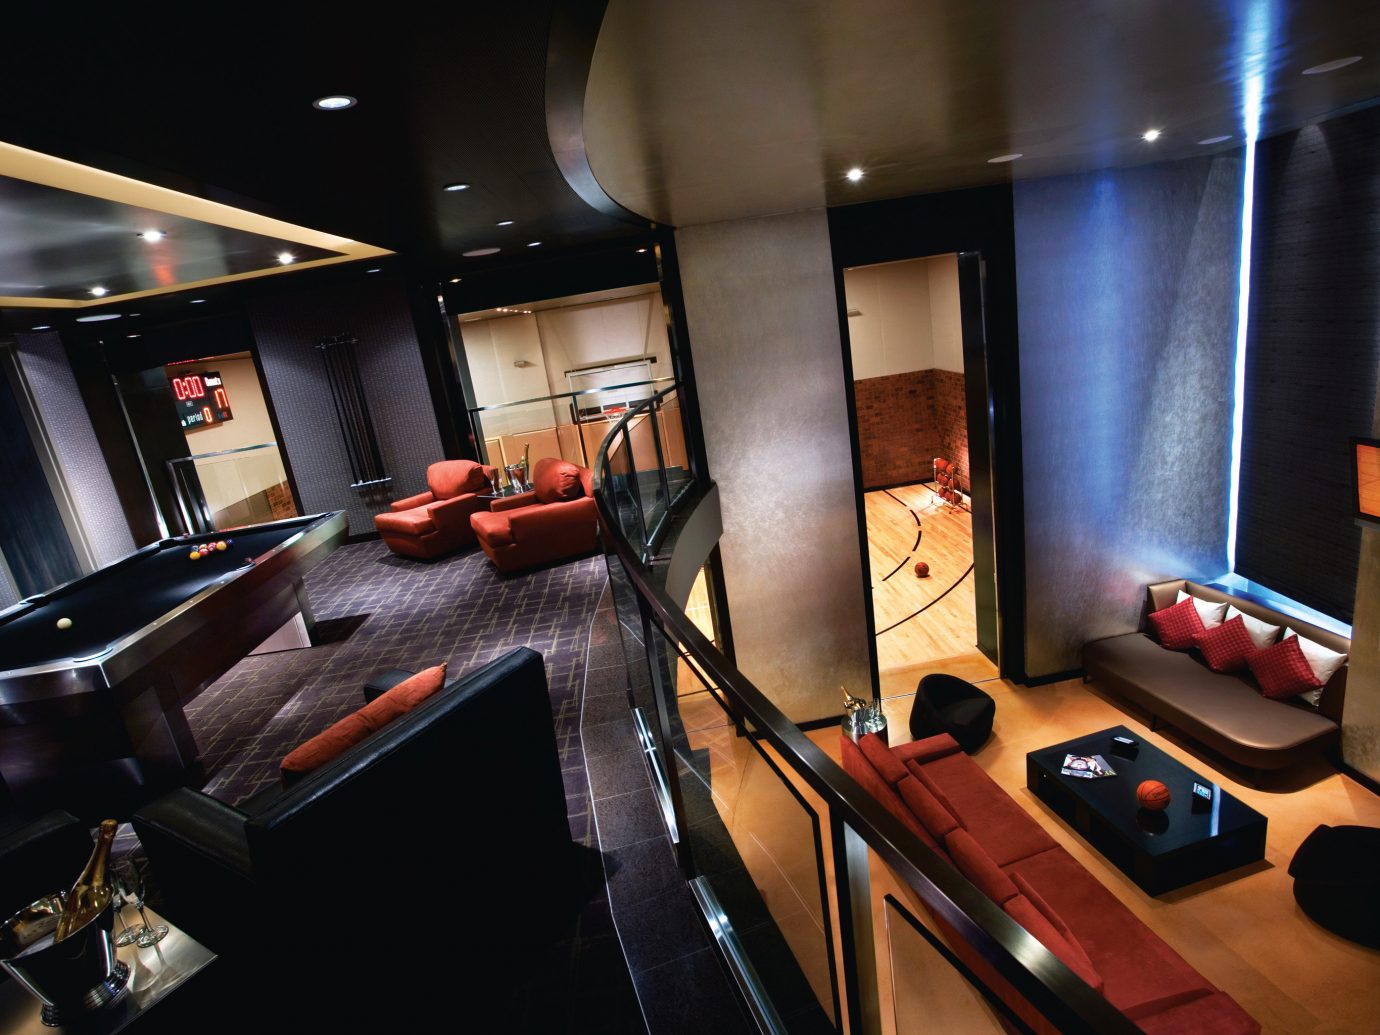 Hotels Luxury Travel indoor recreation room interior design studio